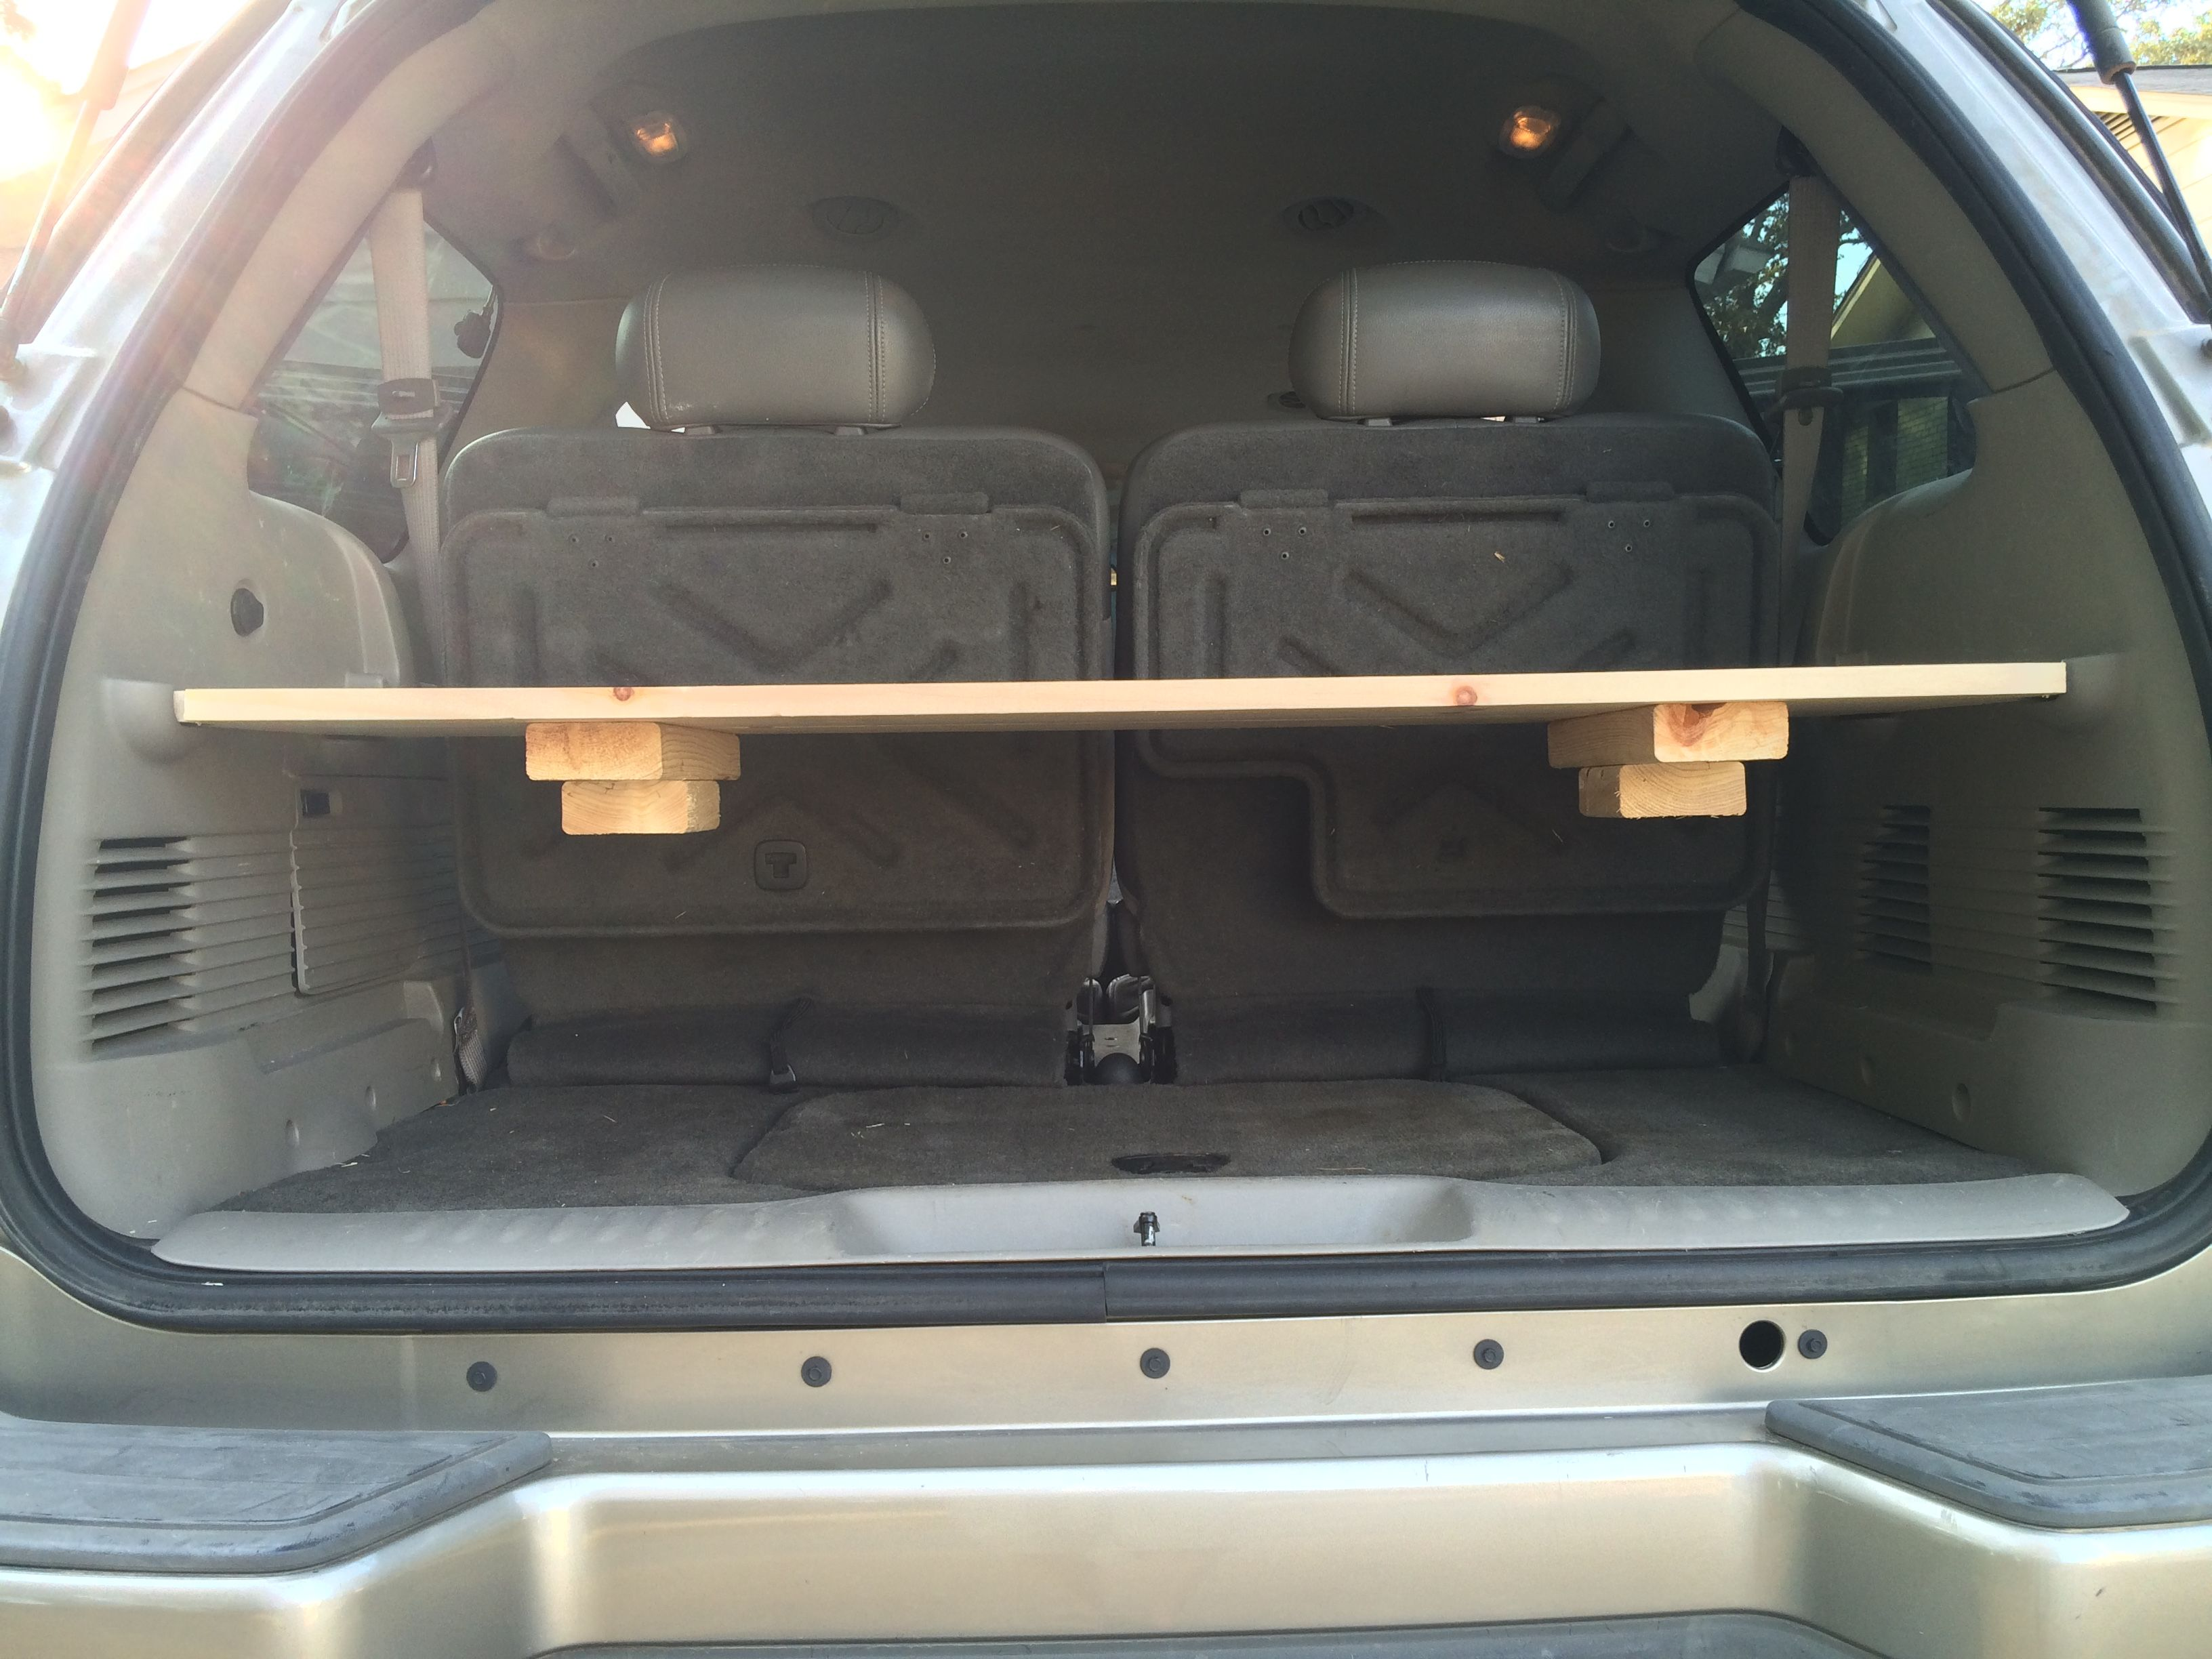 14 Diy Cargo Shelf For Chevy Trailblazer Chevy Trailblazer